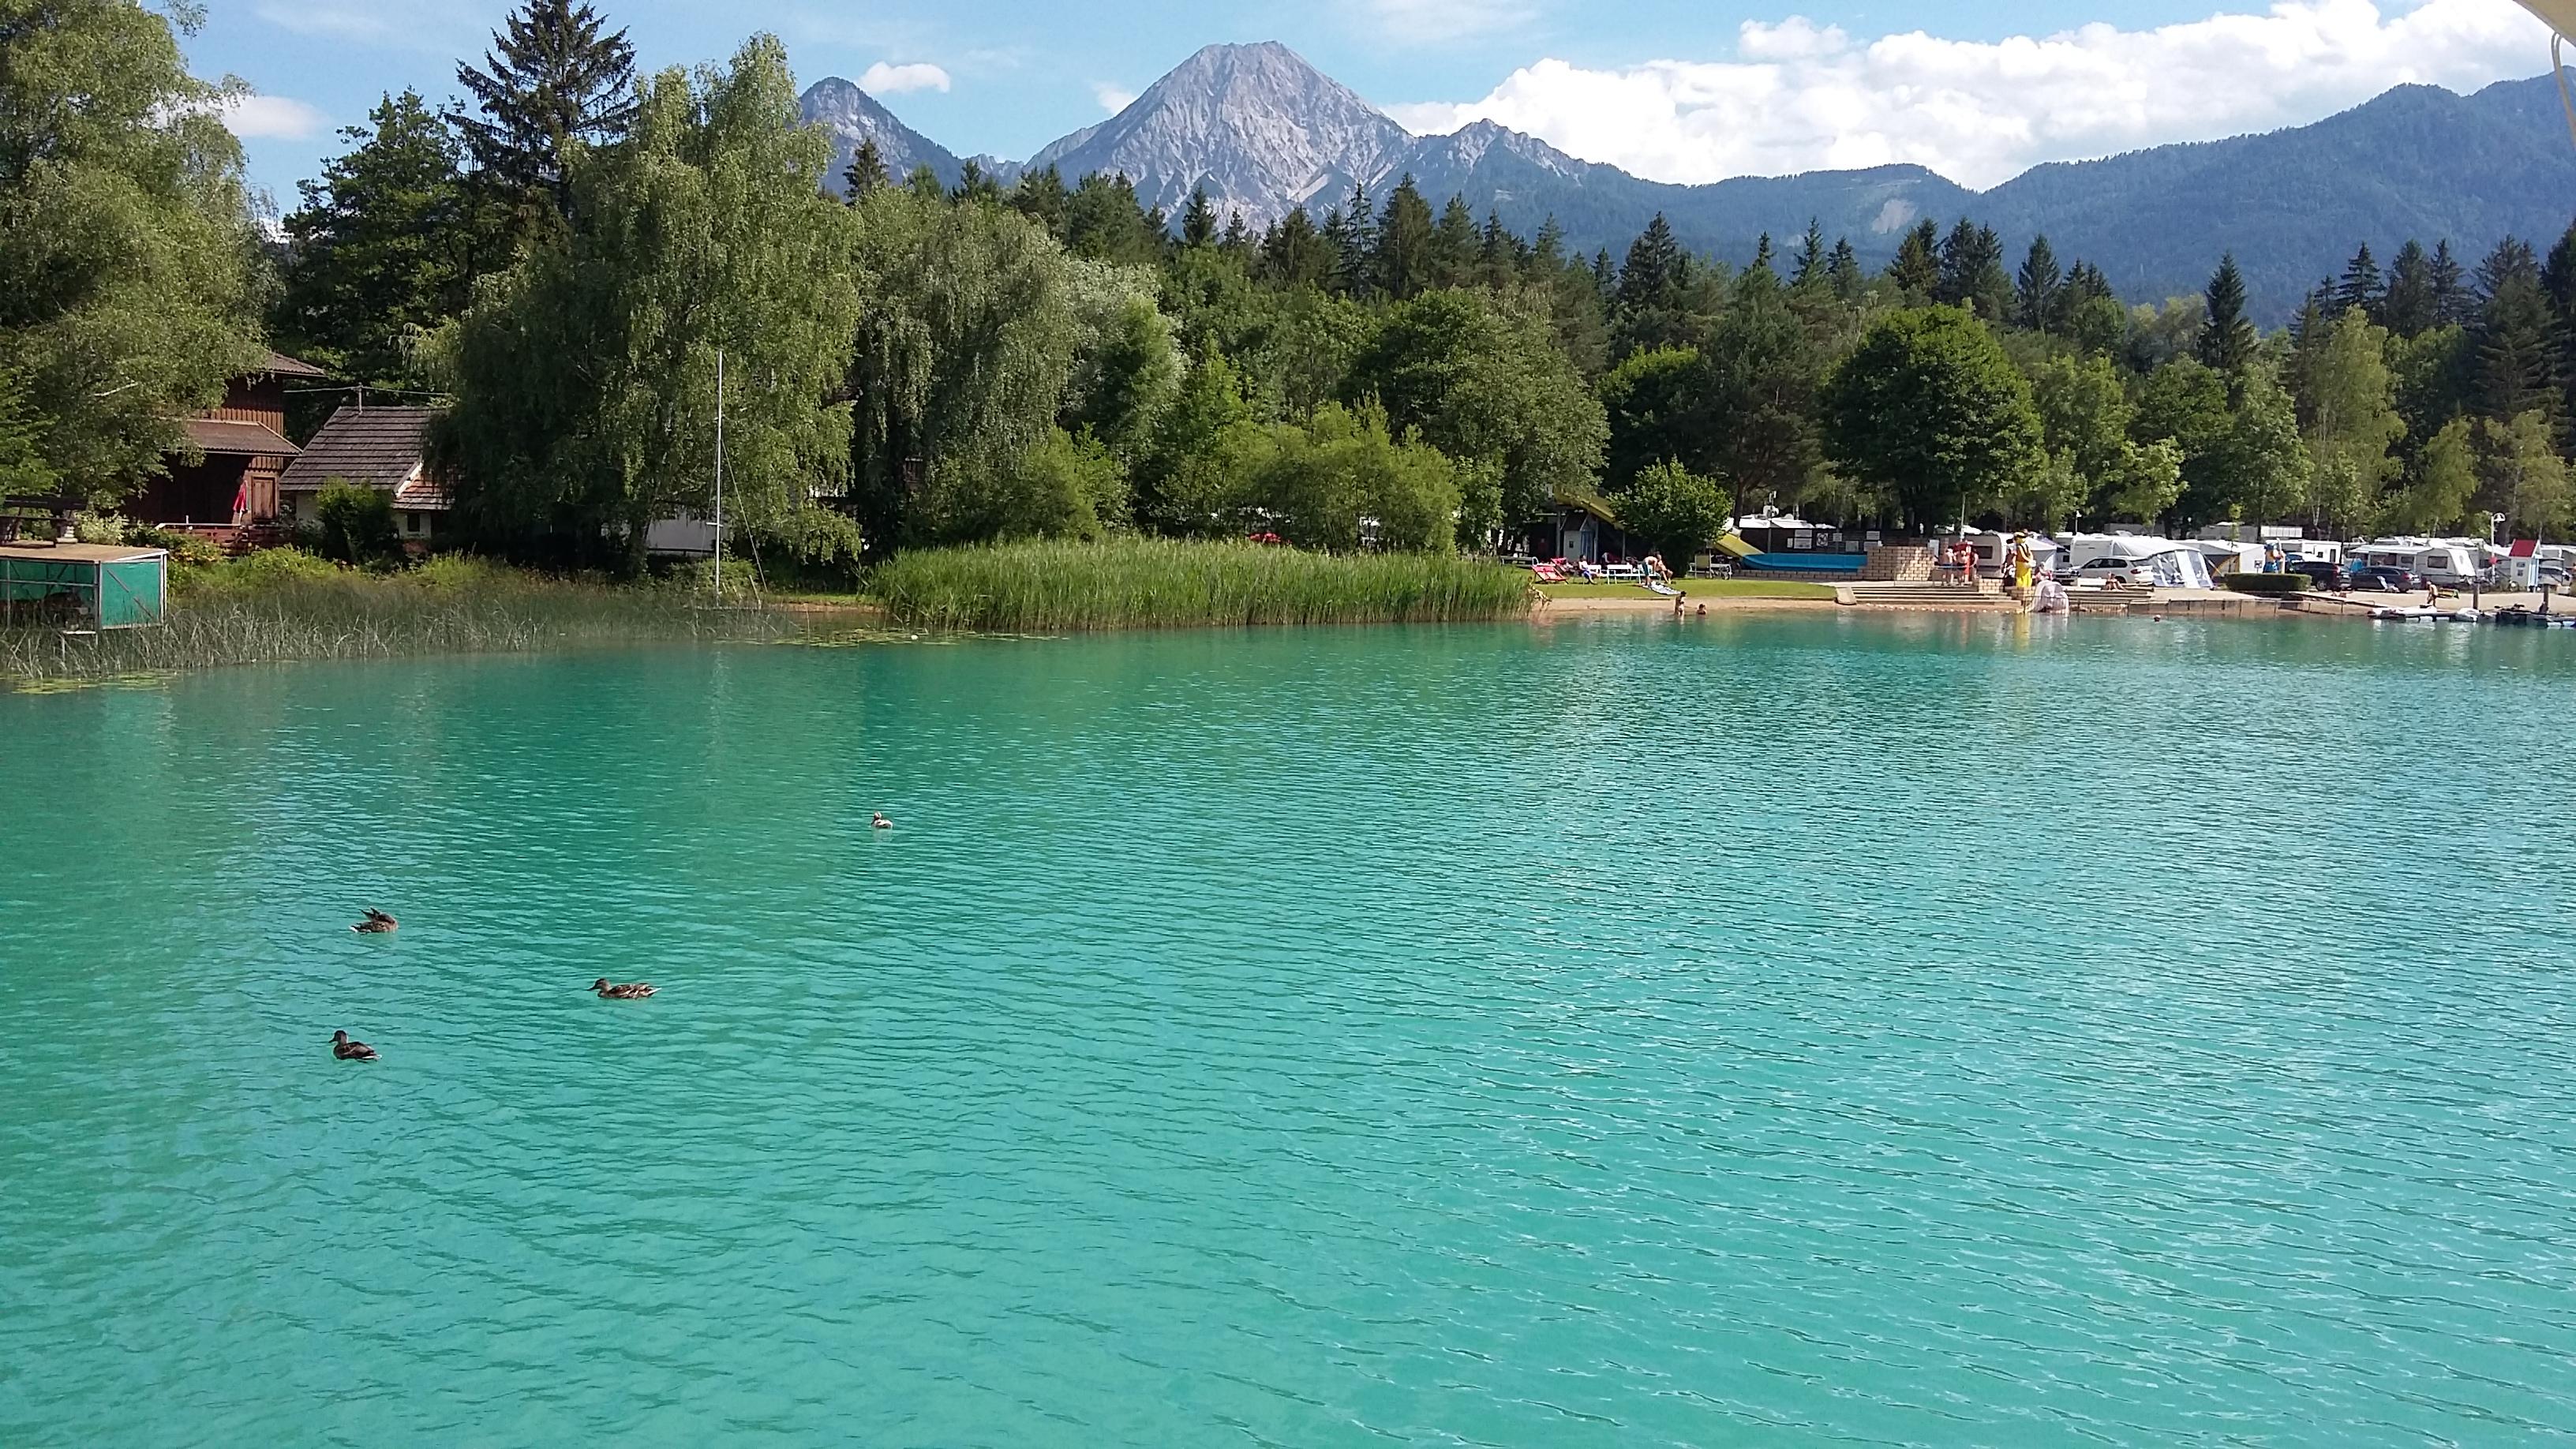 Camping Anderwald nad samym jeziorem